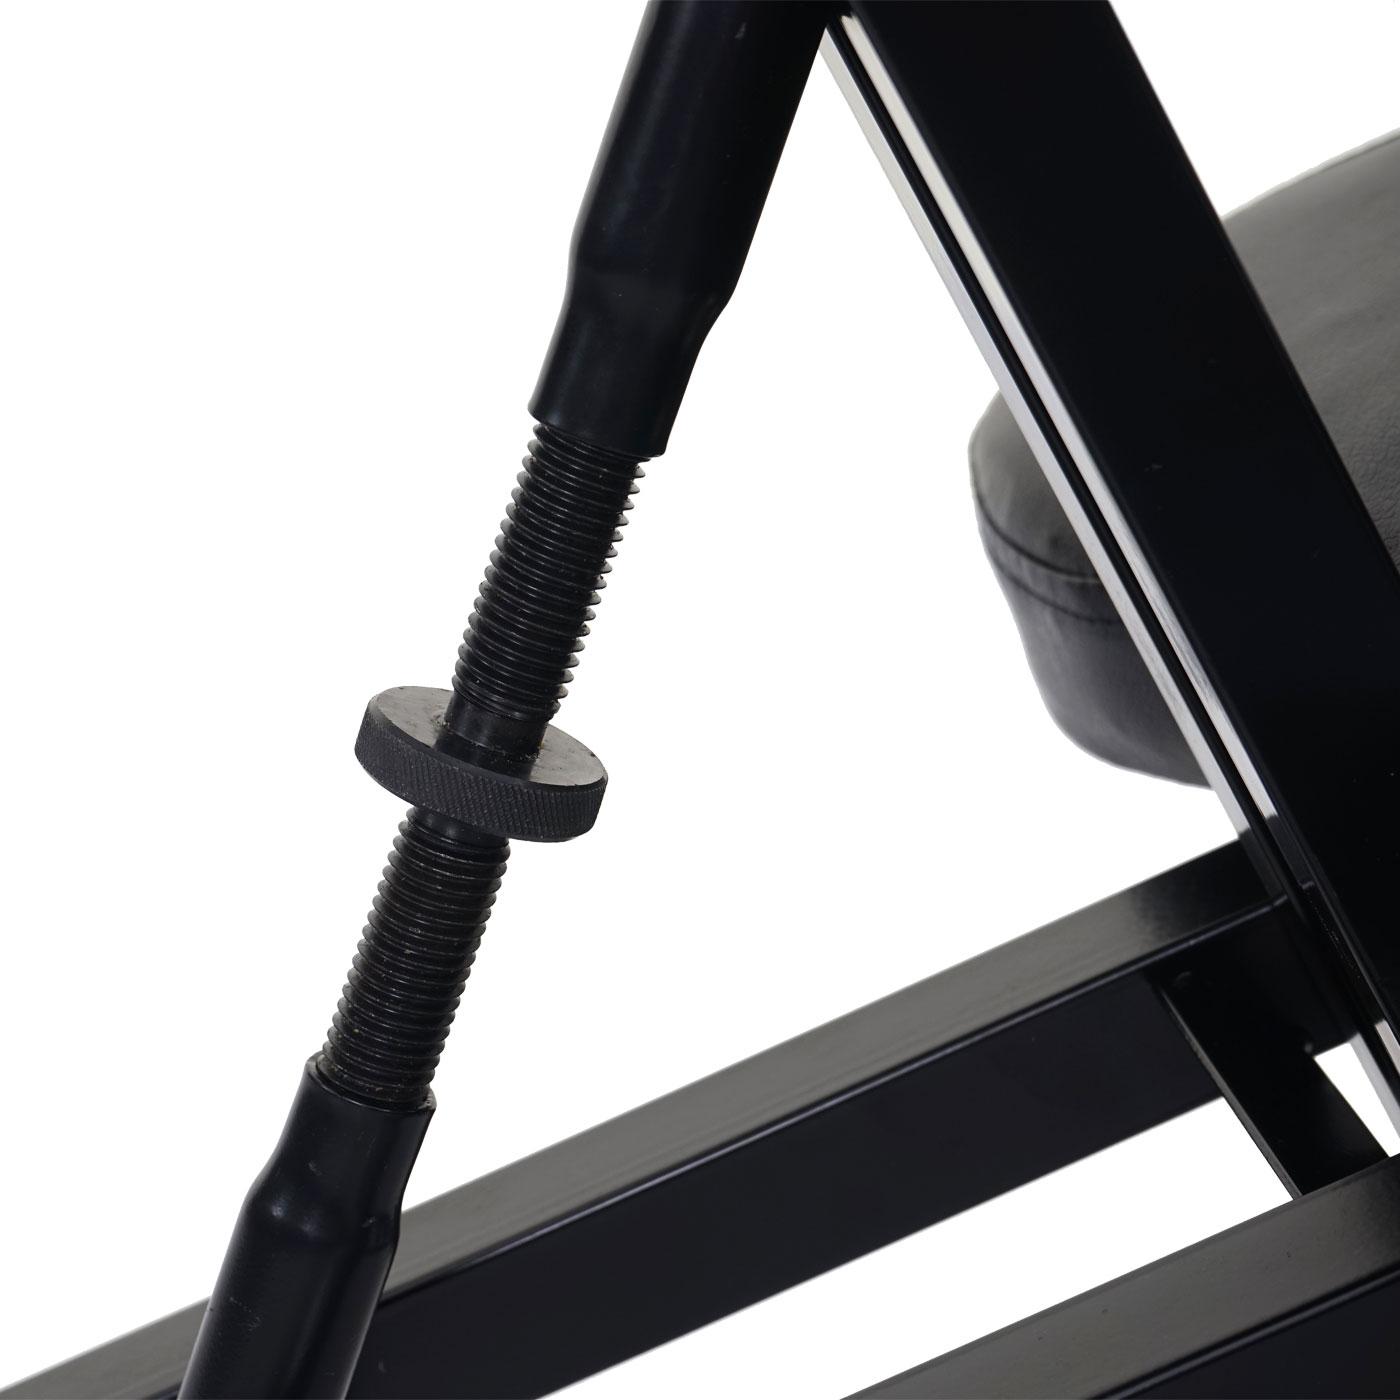 Kunstleder Metall schwarz Kniehocker höhenverstellbar Kniestuhl MCW-E10